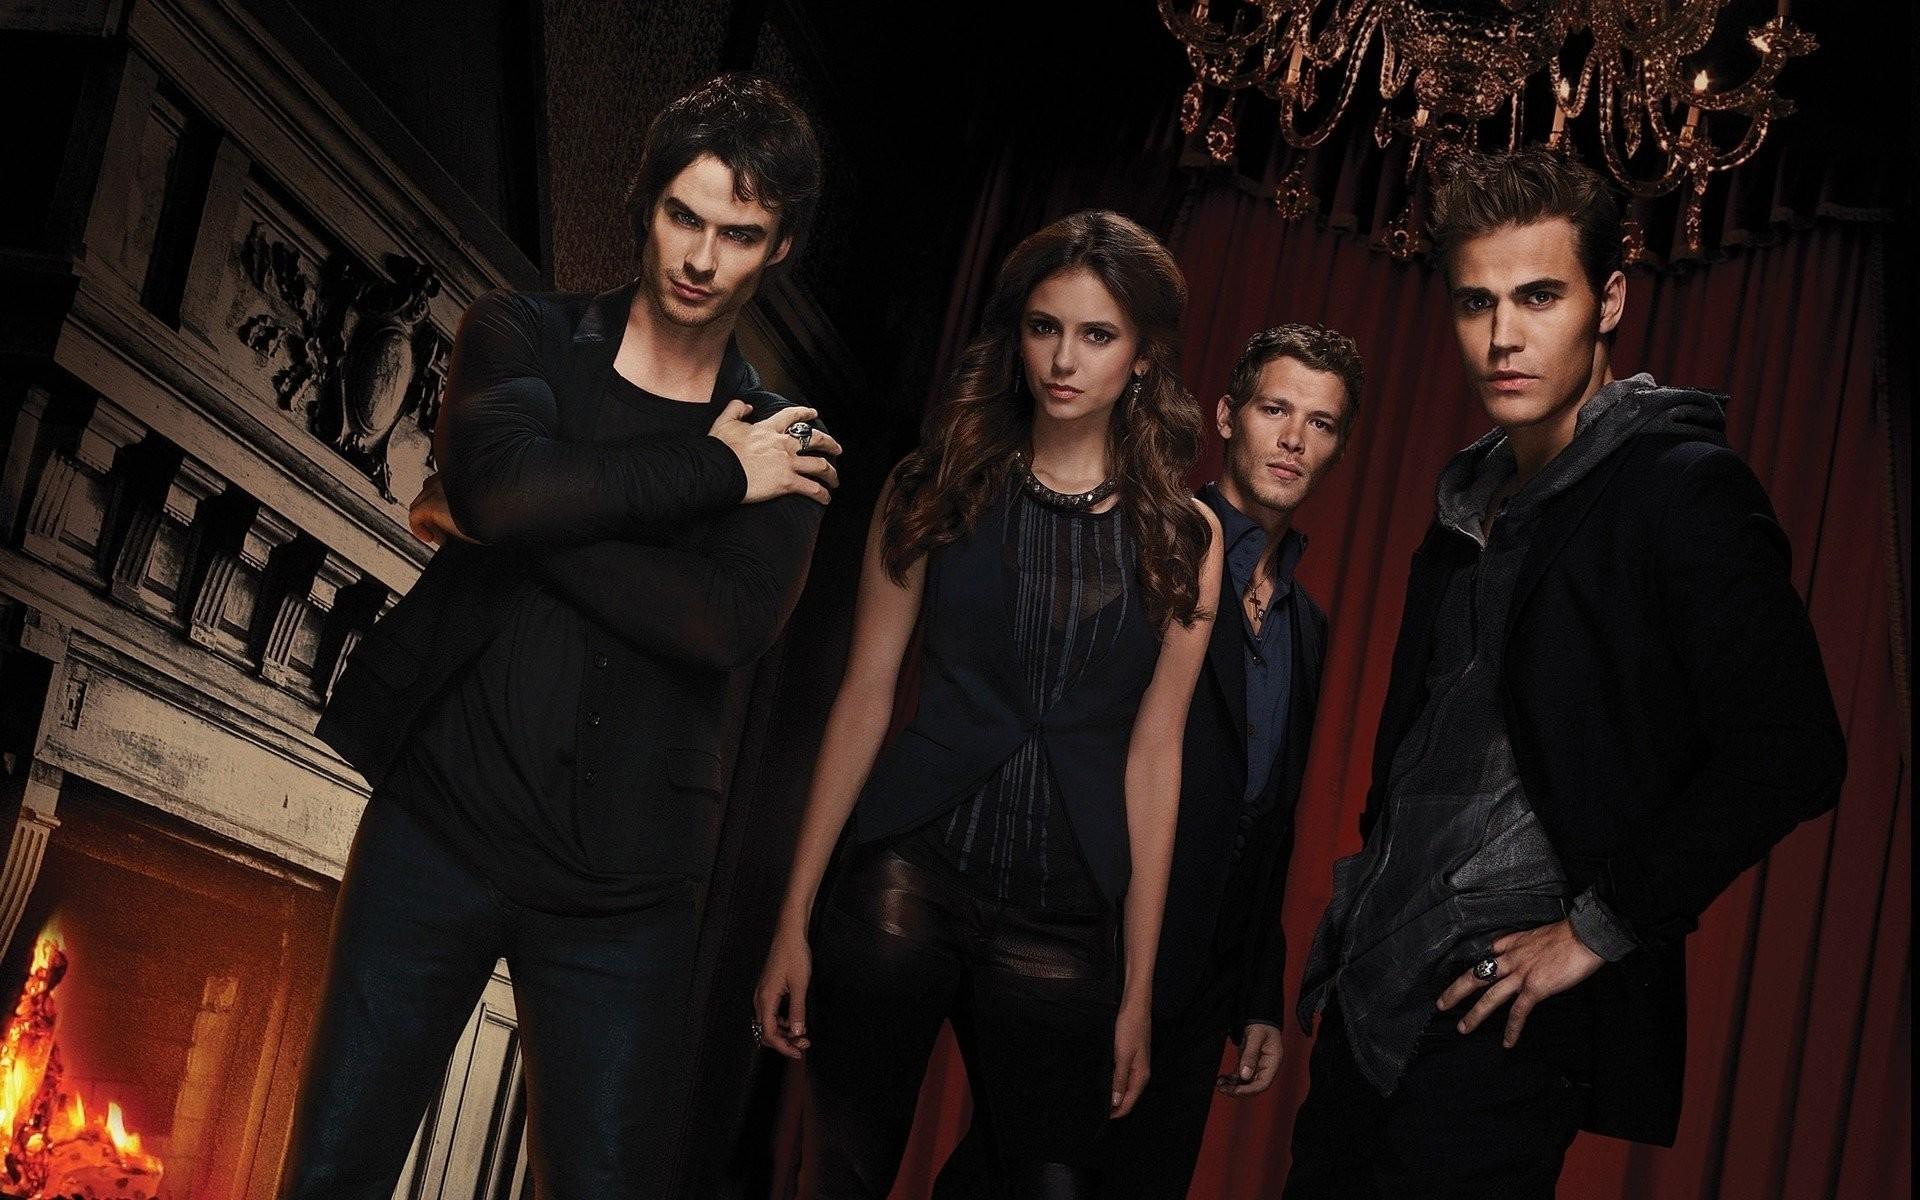 Damon Salvatore And Stefan Salvatore And Elena , HD Wallpaper & Backgrounds